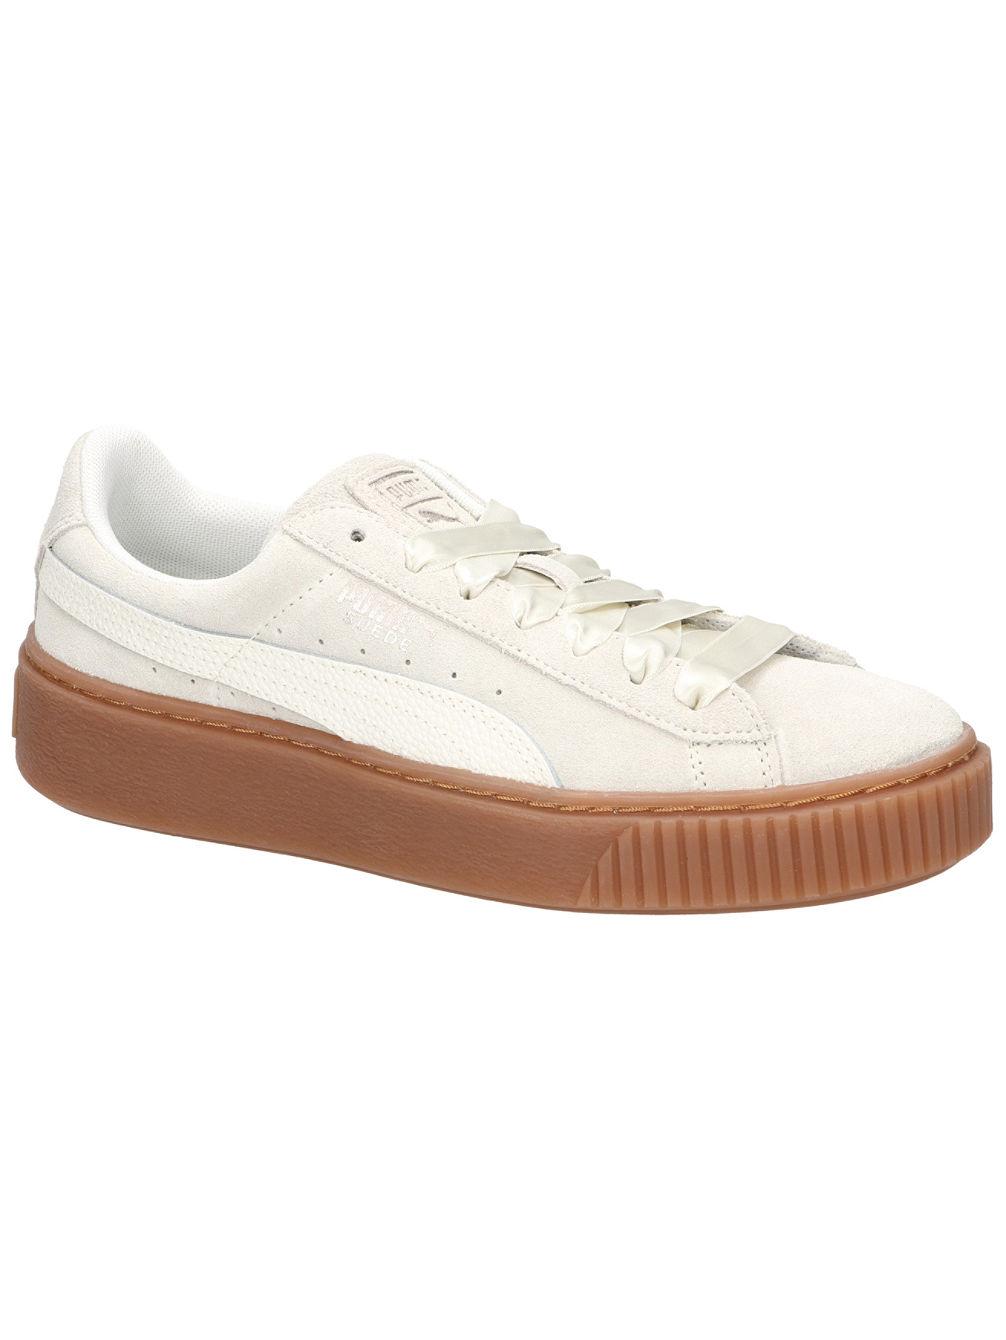 45e078c07f232 Buy Puma Suede Platform Bubble Sneakers online at Blue Tomato